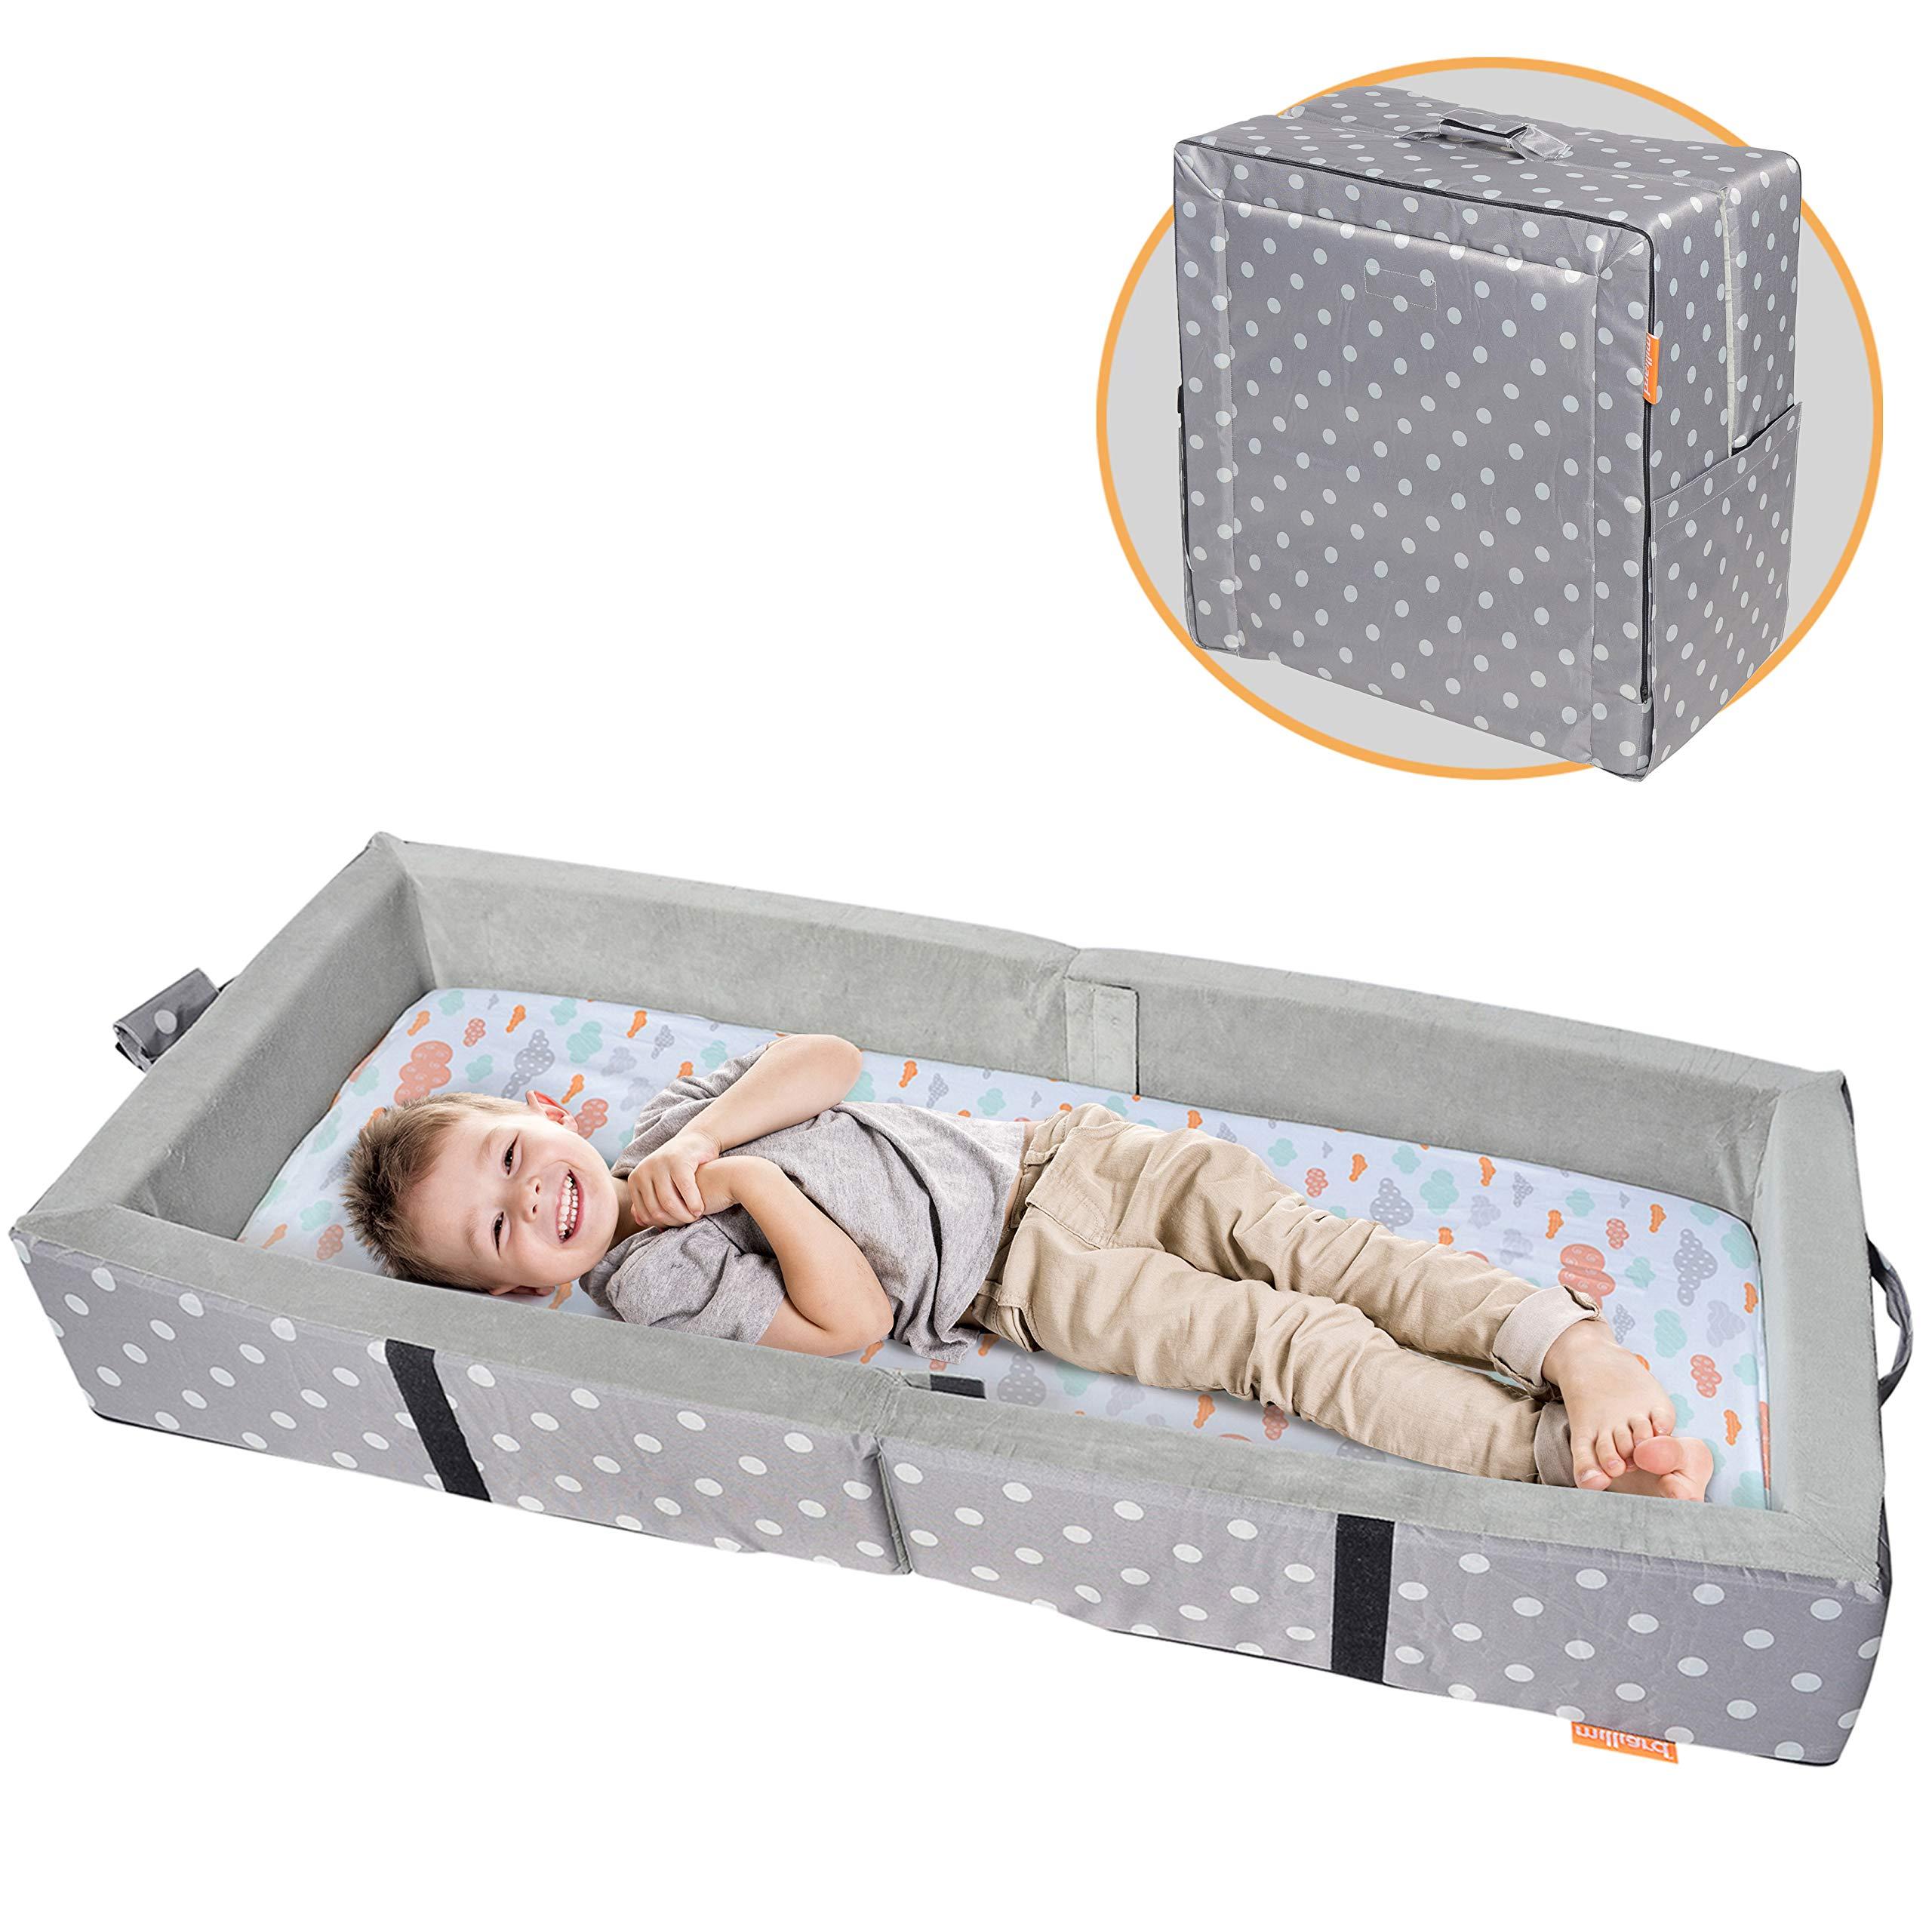 Milliard Portable Toddler Bumper Travel